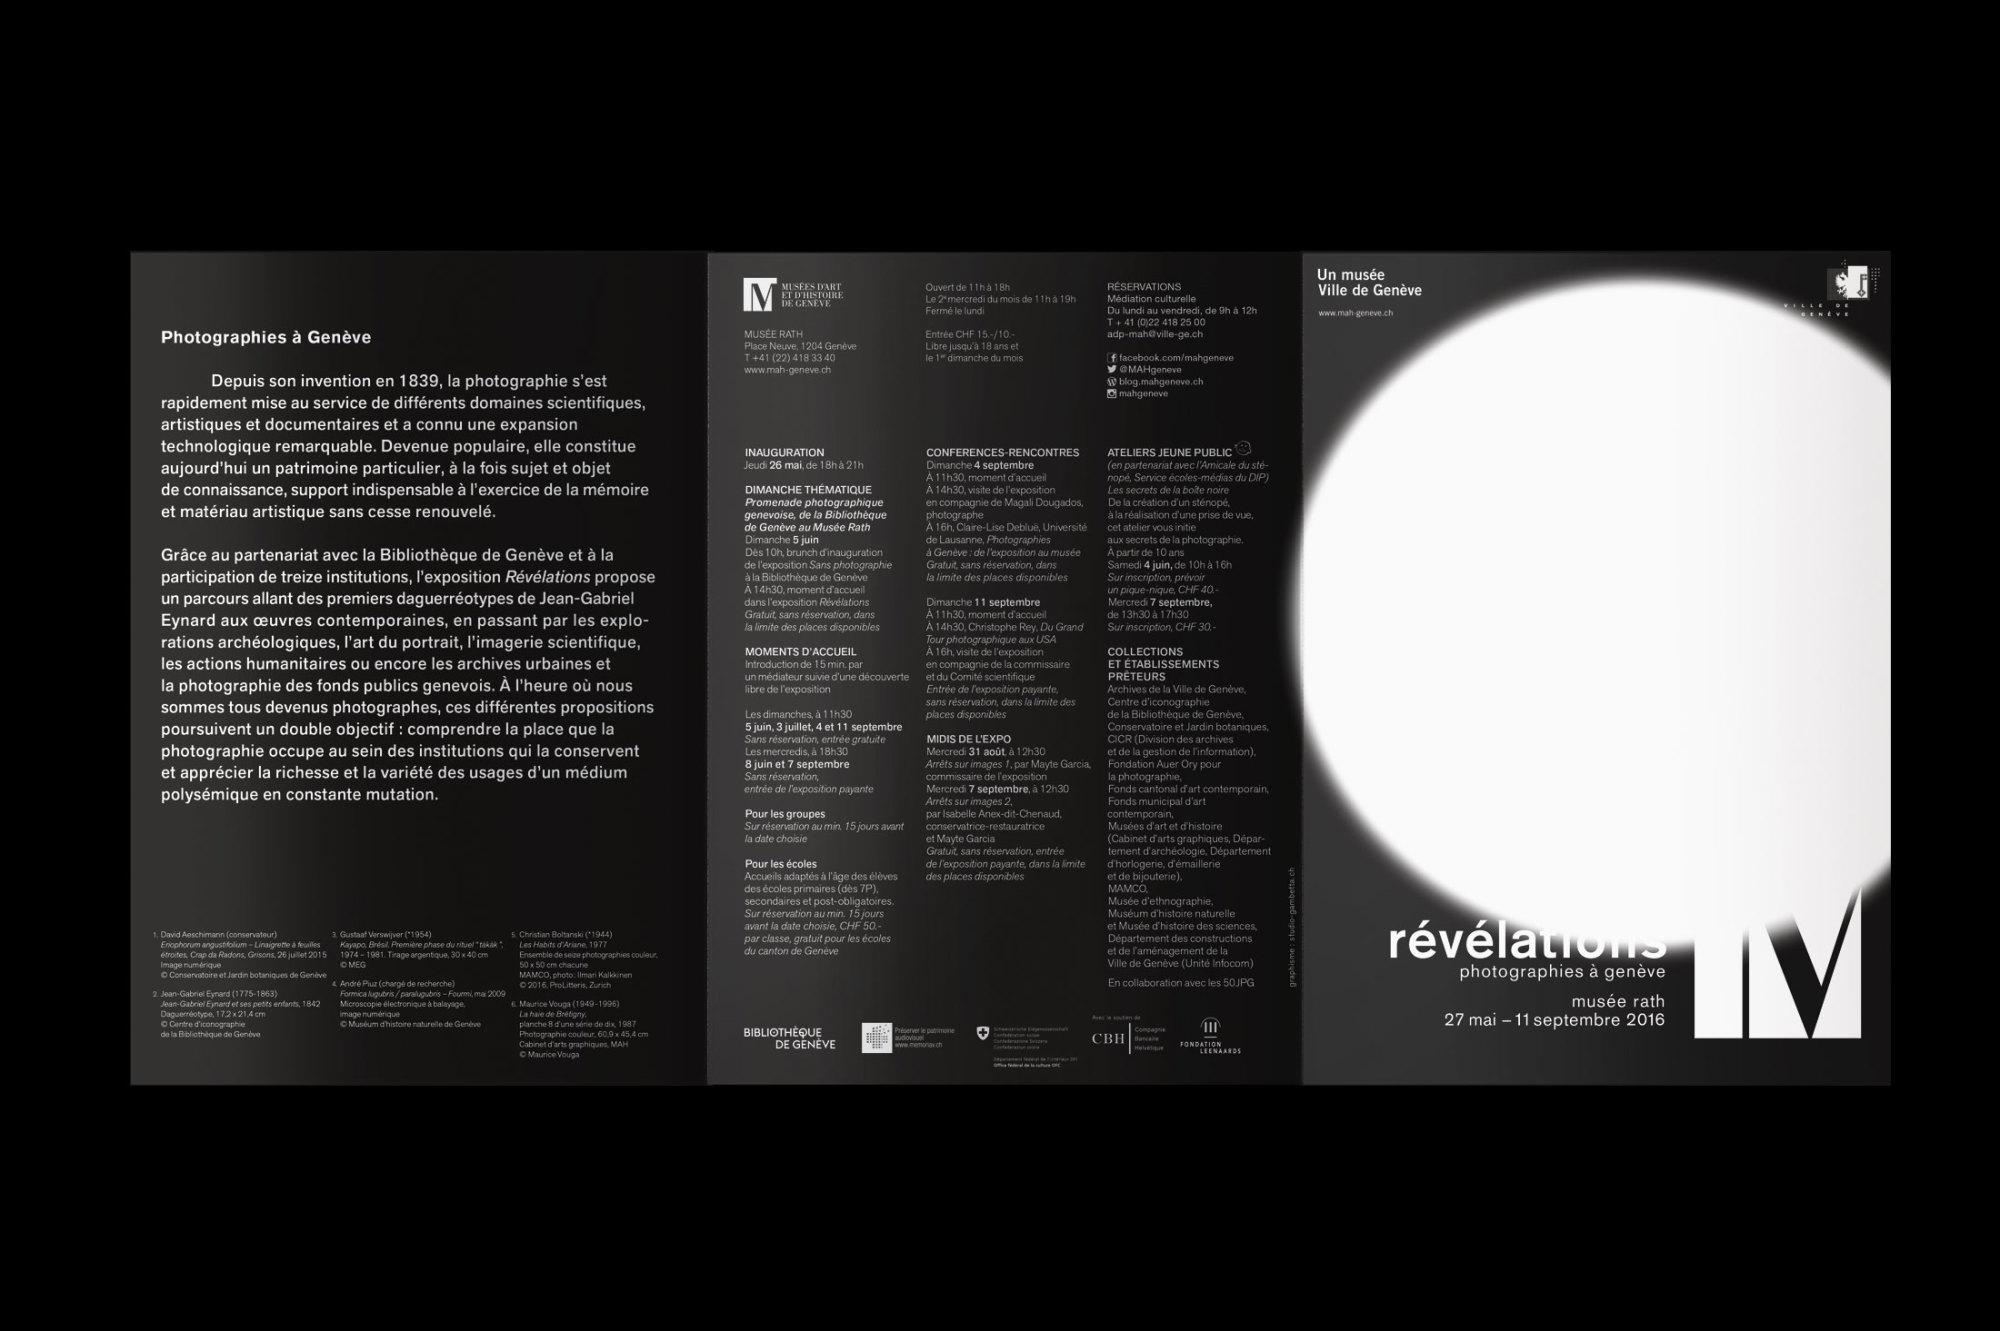 Graphisme Geneve graphic design graphique direction artistique mah exposition musee d'ethnographie 2016 musee rath revelations photographies serigraphie  carton d'invitation